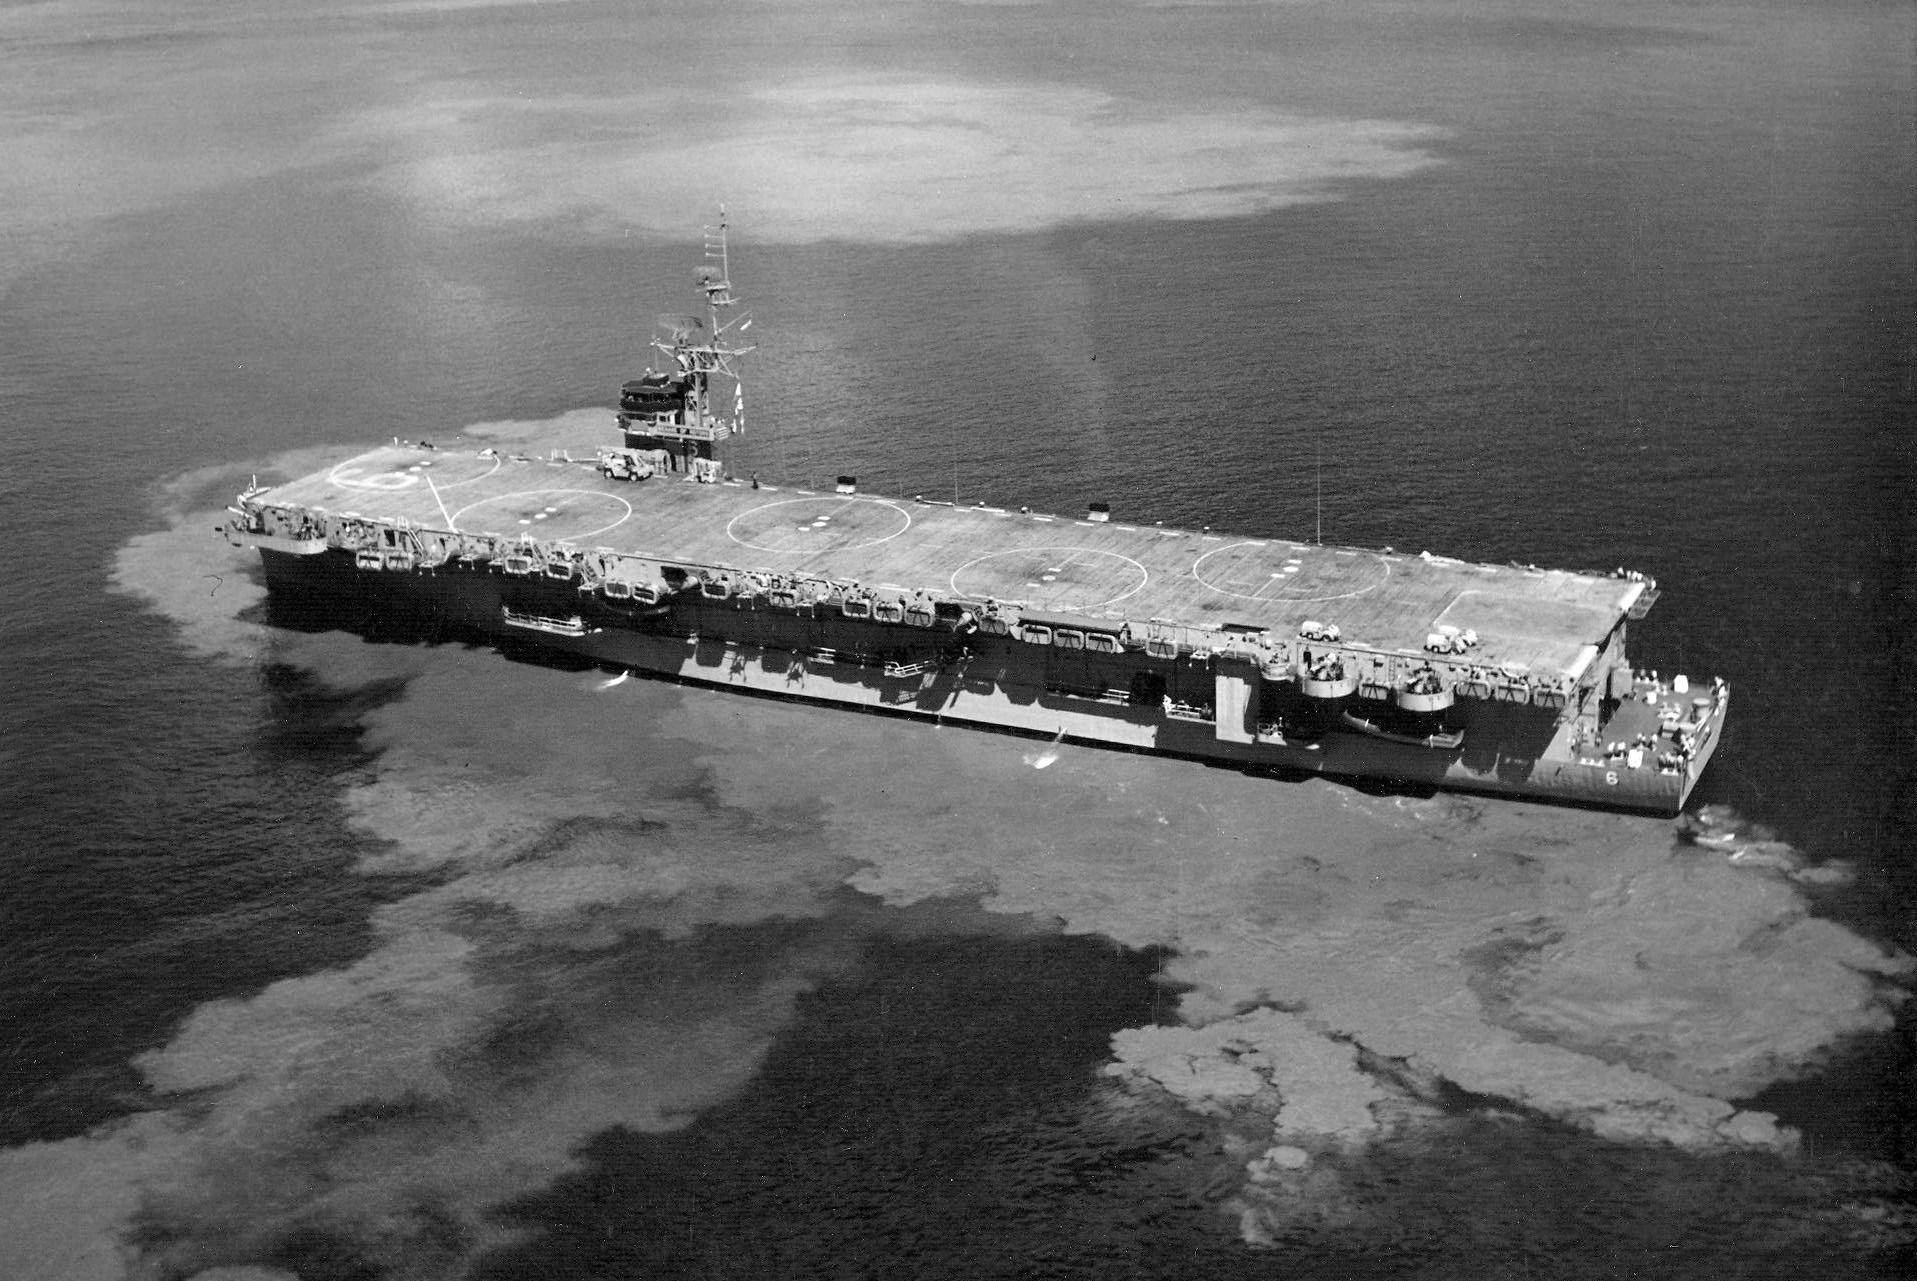 Thetis Bay as helicopter carrier LPH-6, circa 1963